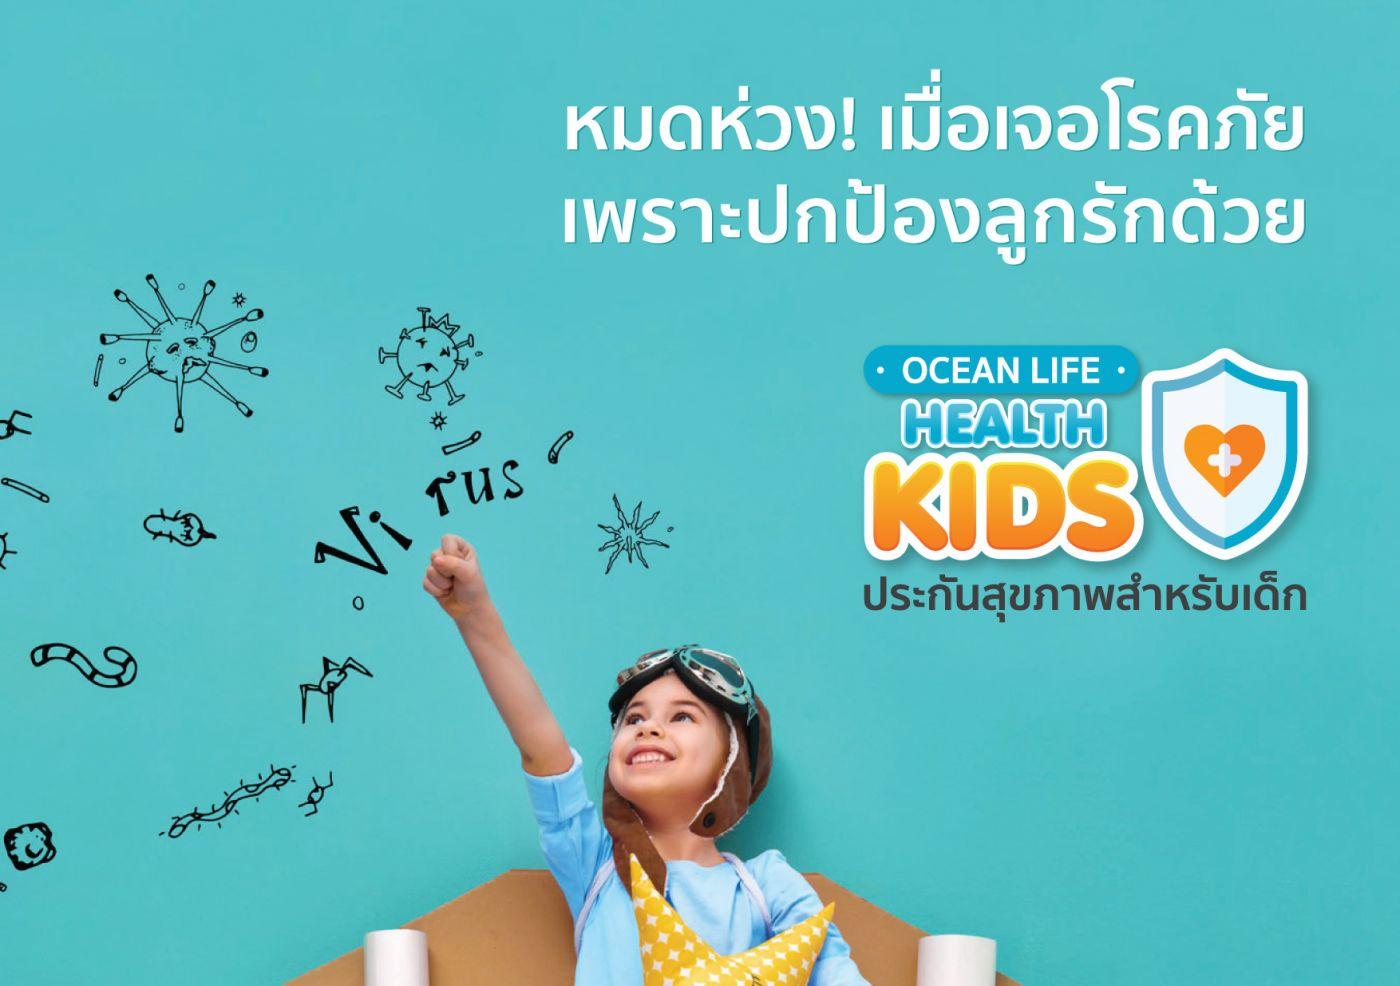 OCEAN LIFE ไทยสมุทร ส่งประกันสุขภาพสำหรับเด็ก Health Kids คุ้มครองครบ ปกป้องทุกย่างก้าวของลูกรักให้เติบโตได้อย่างสบายใจ